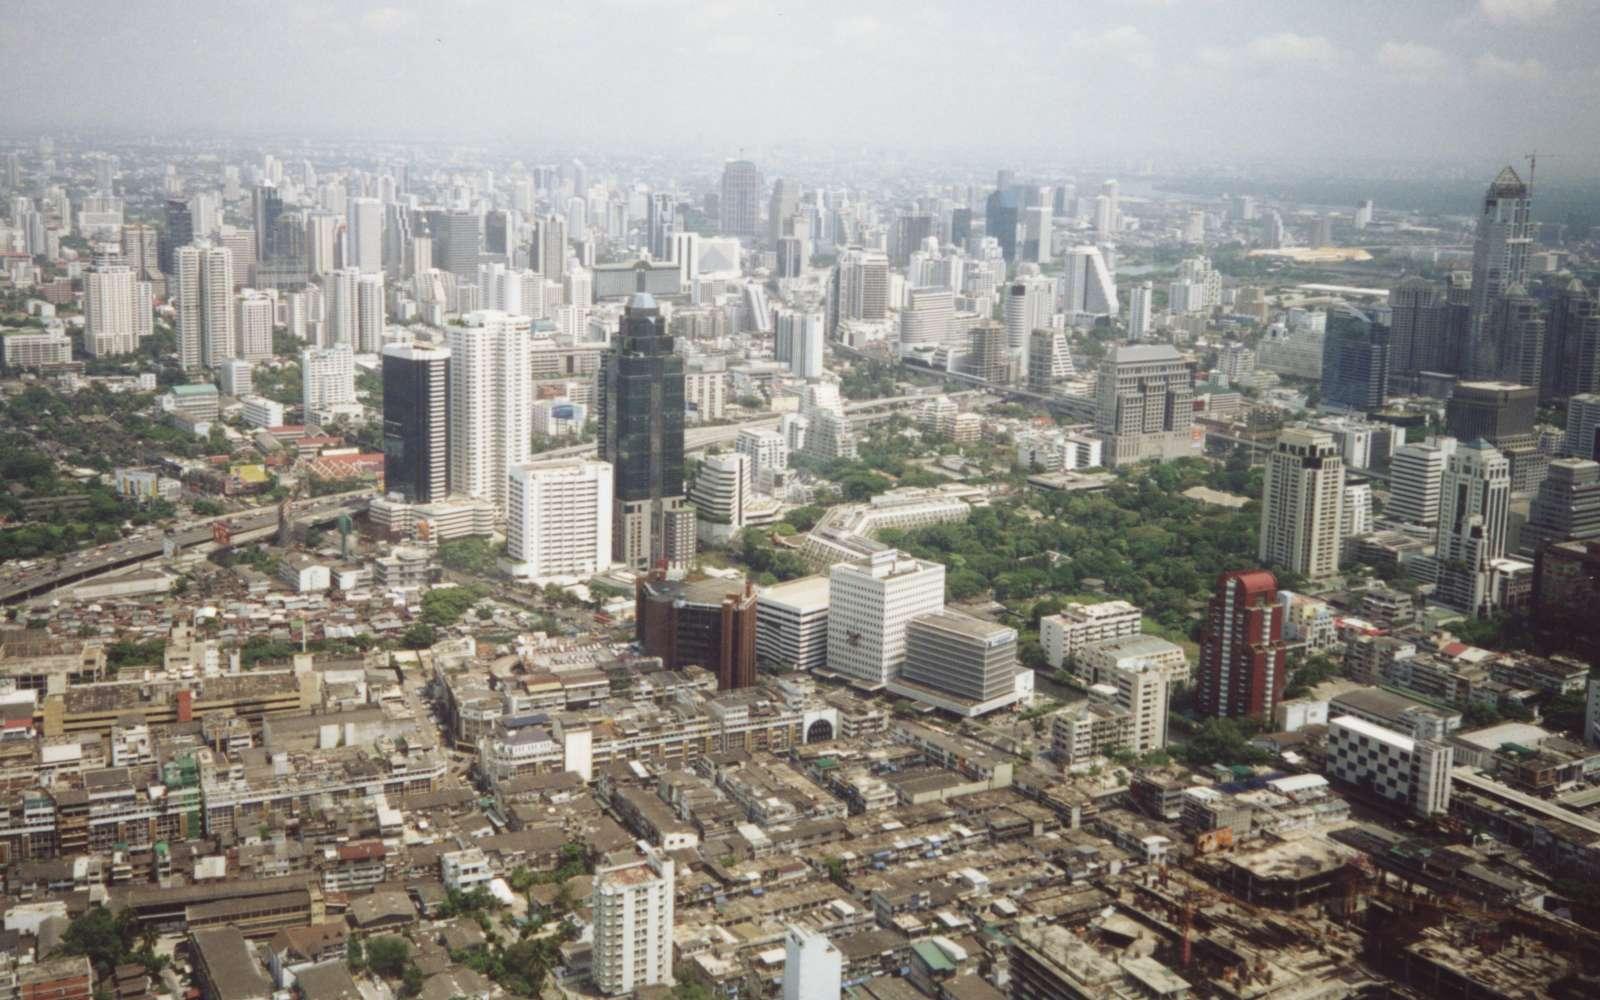 Bangkok today